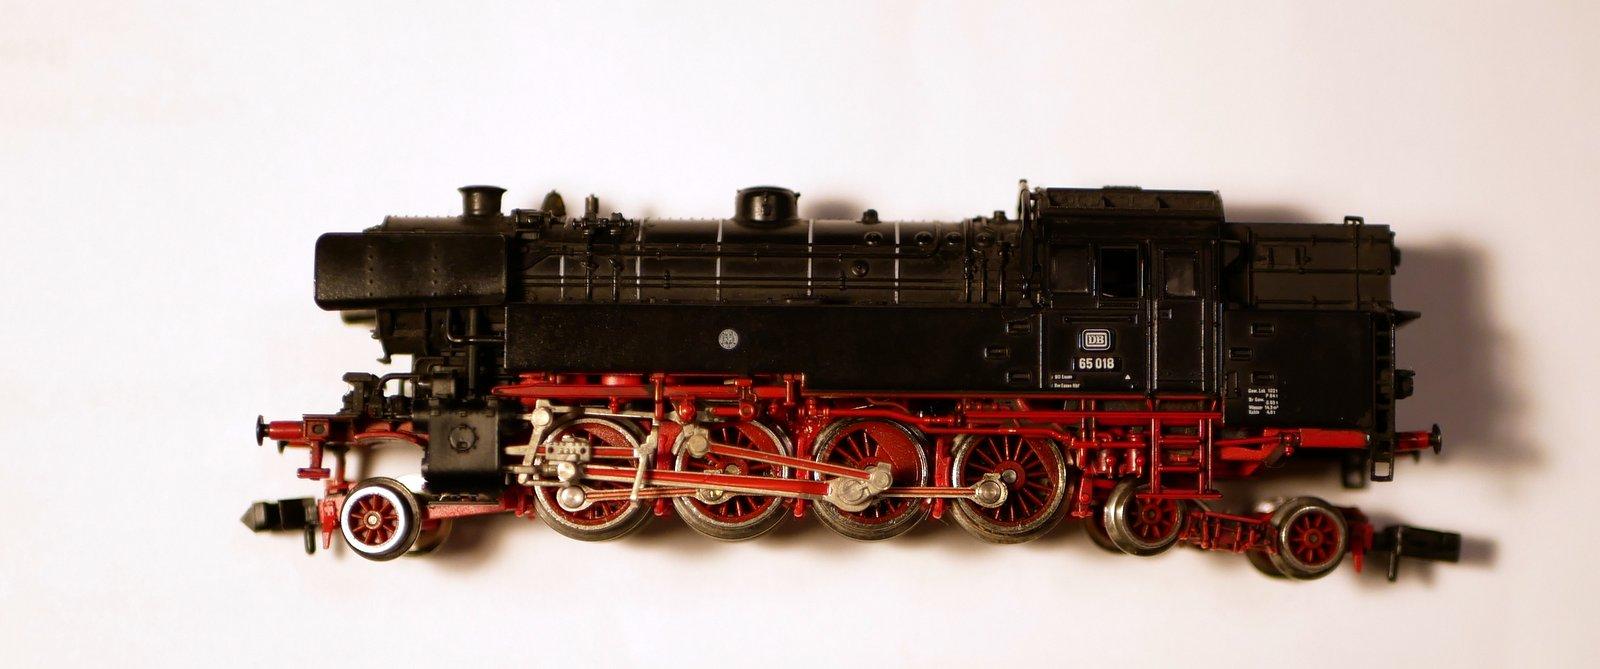 P1130058-001.JPG